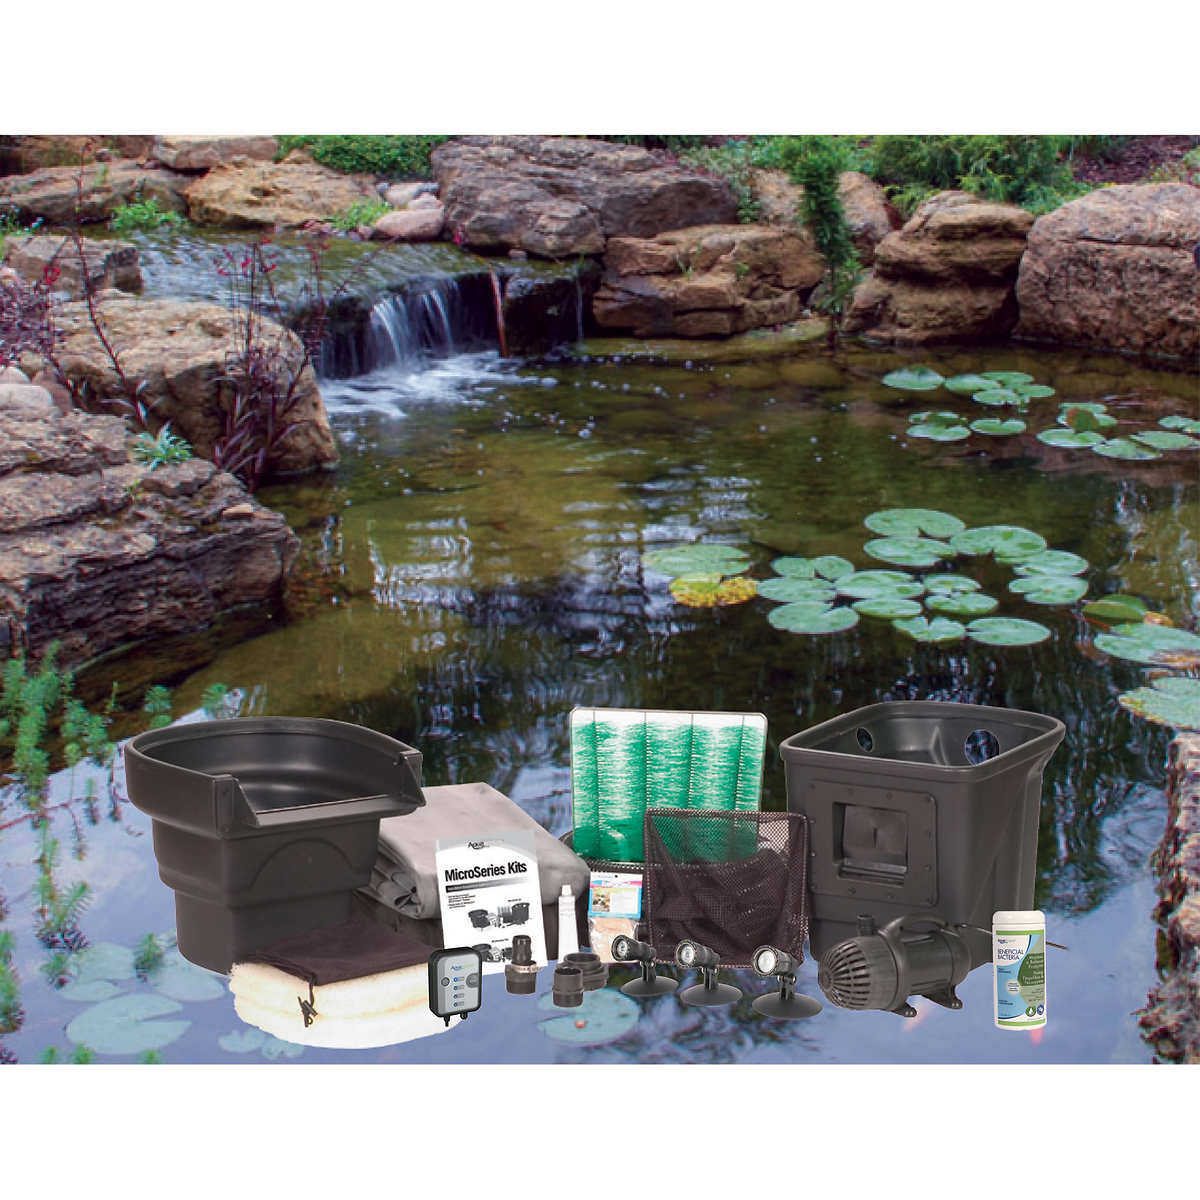 aquascape 8 ft x 11 ft ecosystem pond kit